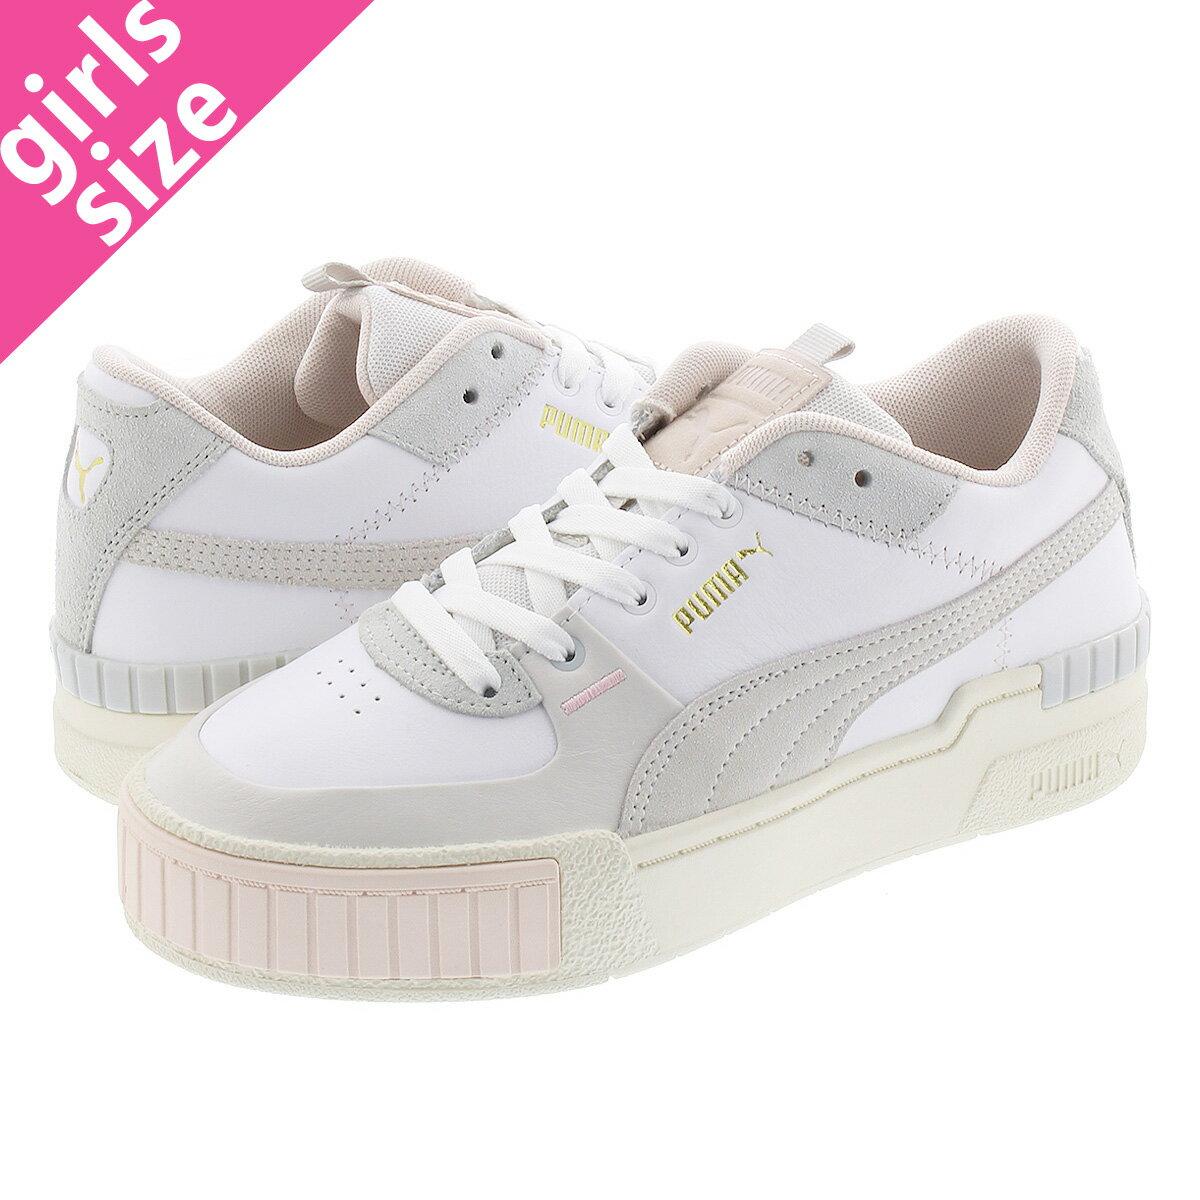 Puma Cali W shoes white pink